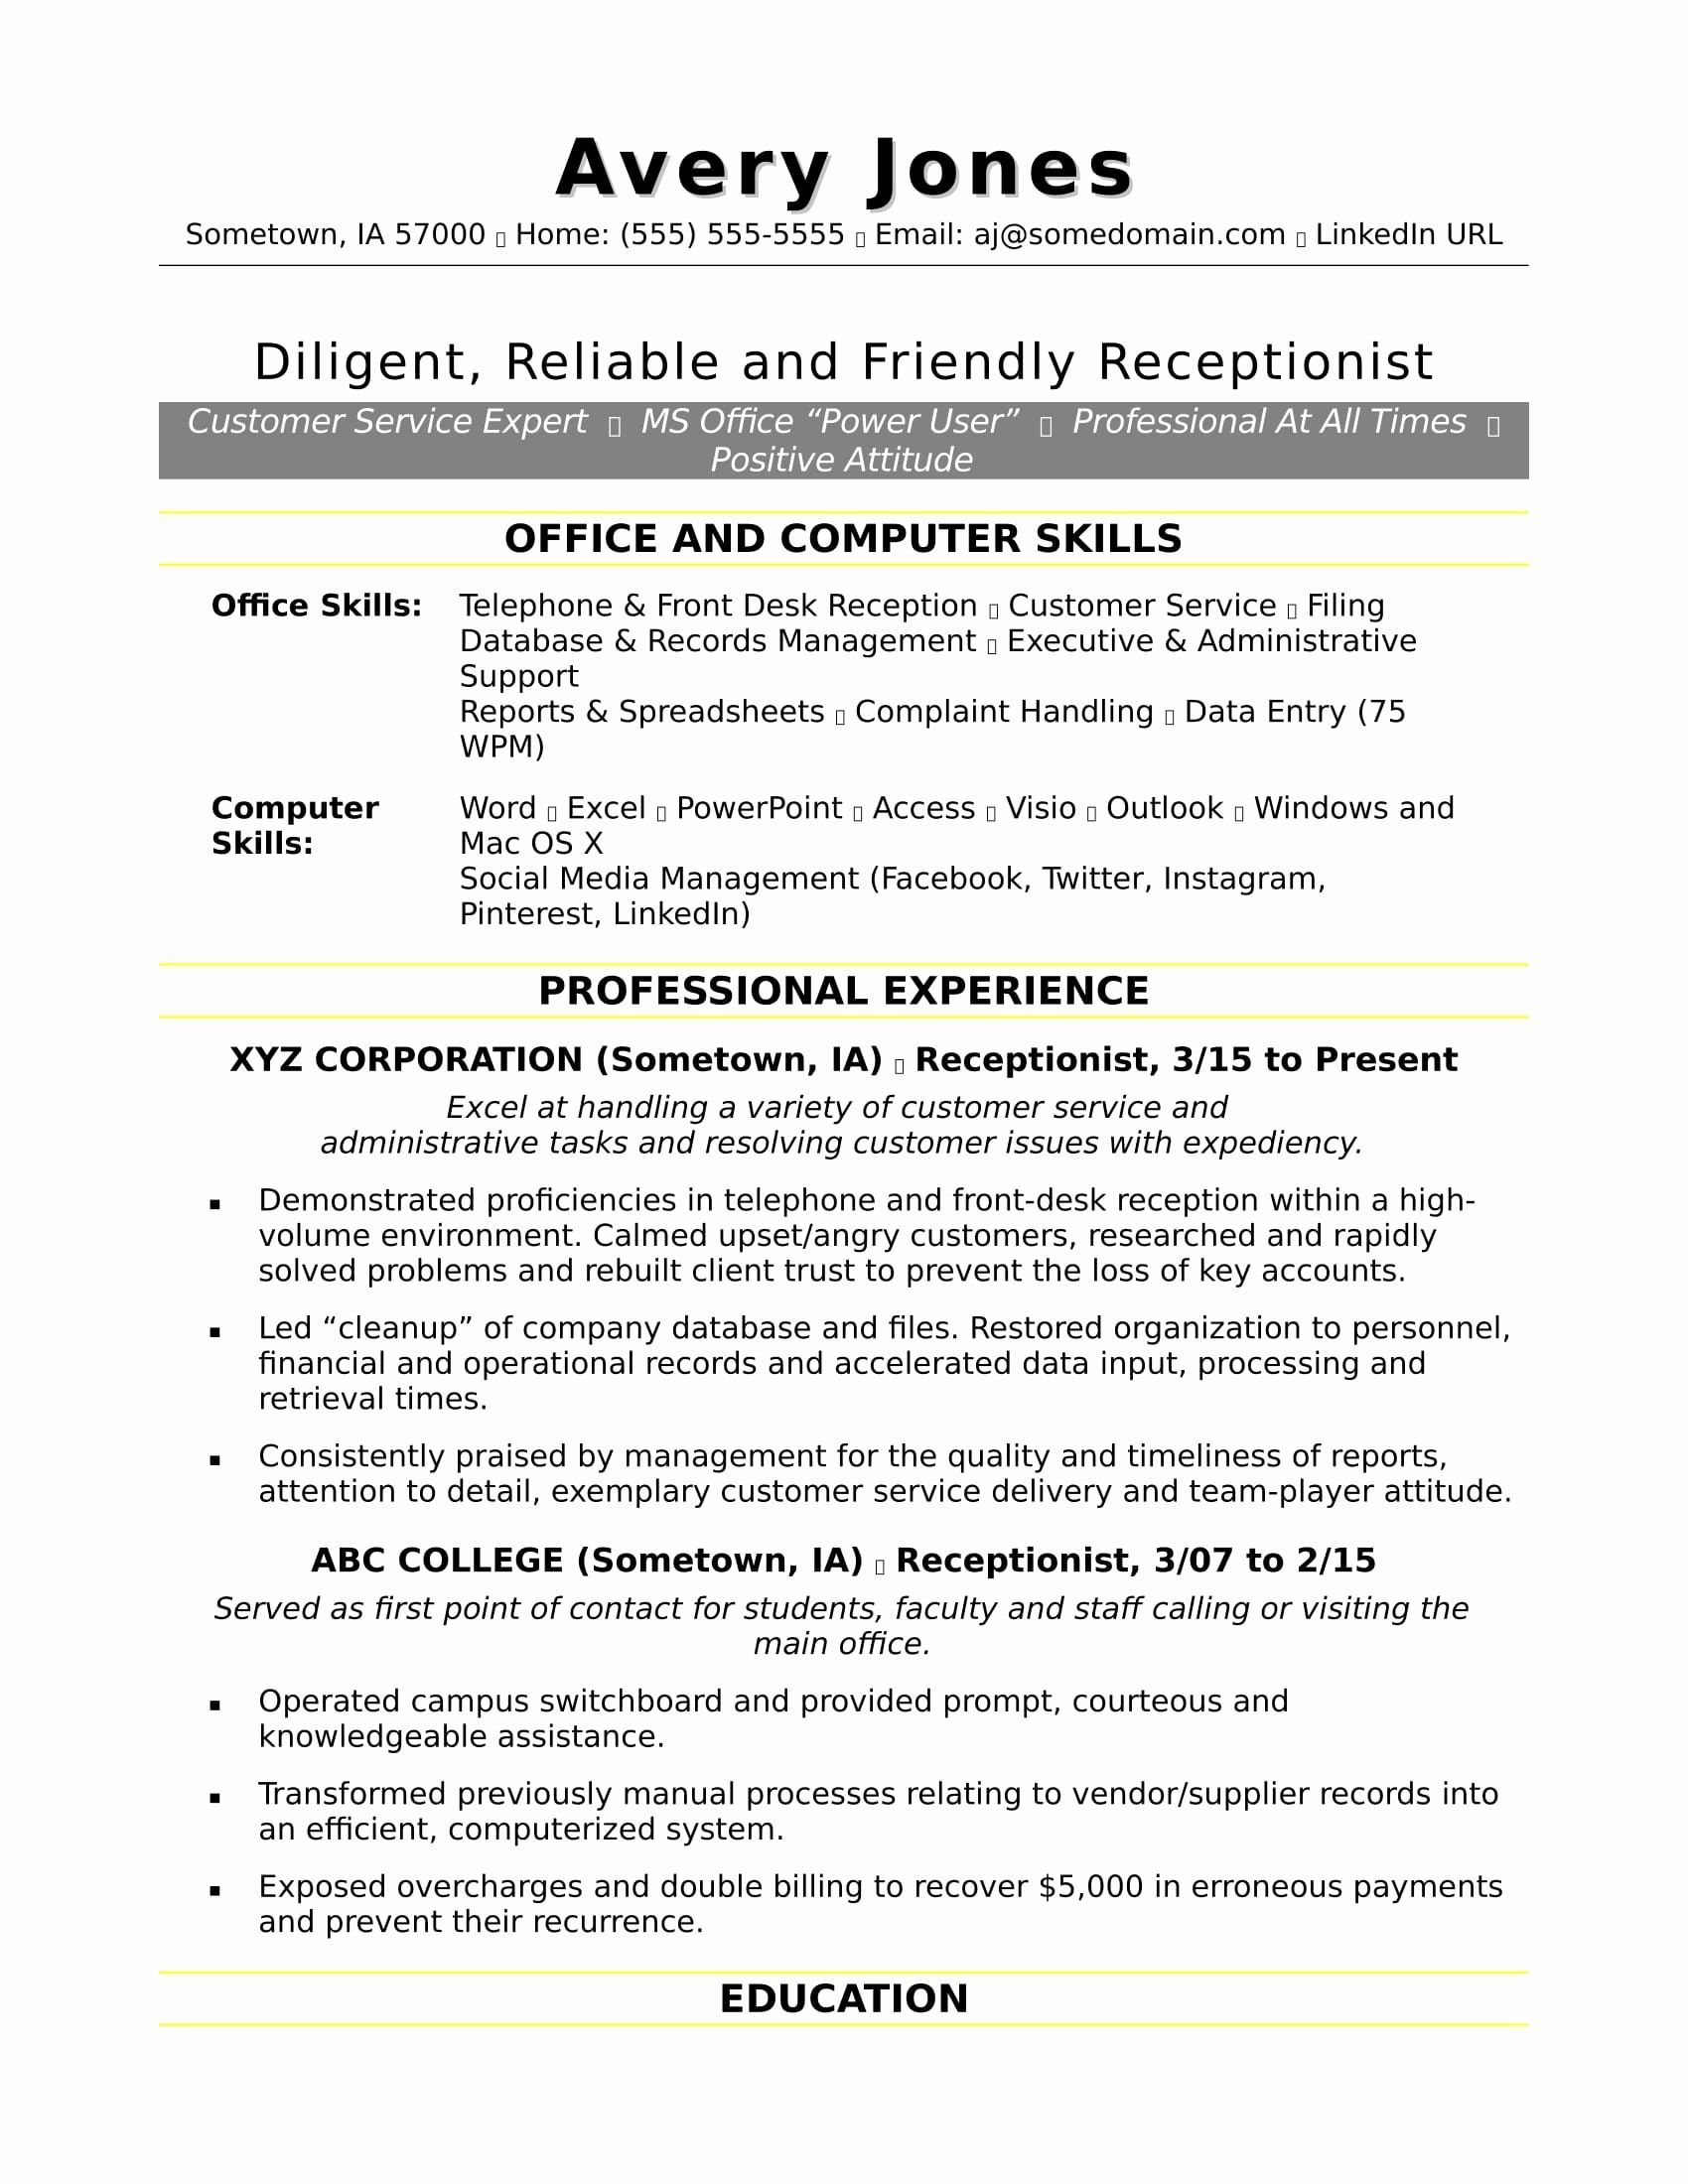 Best bullets for resume receptionist resume